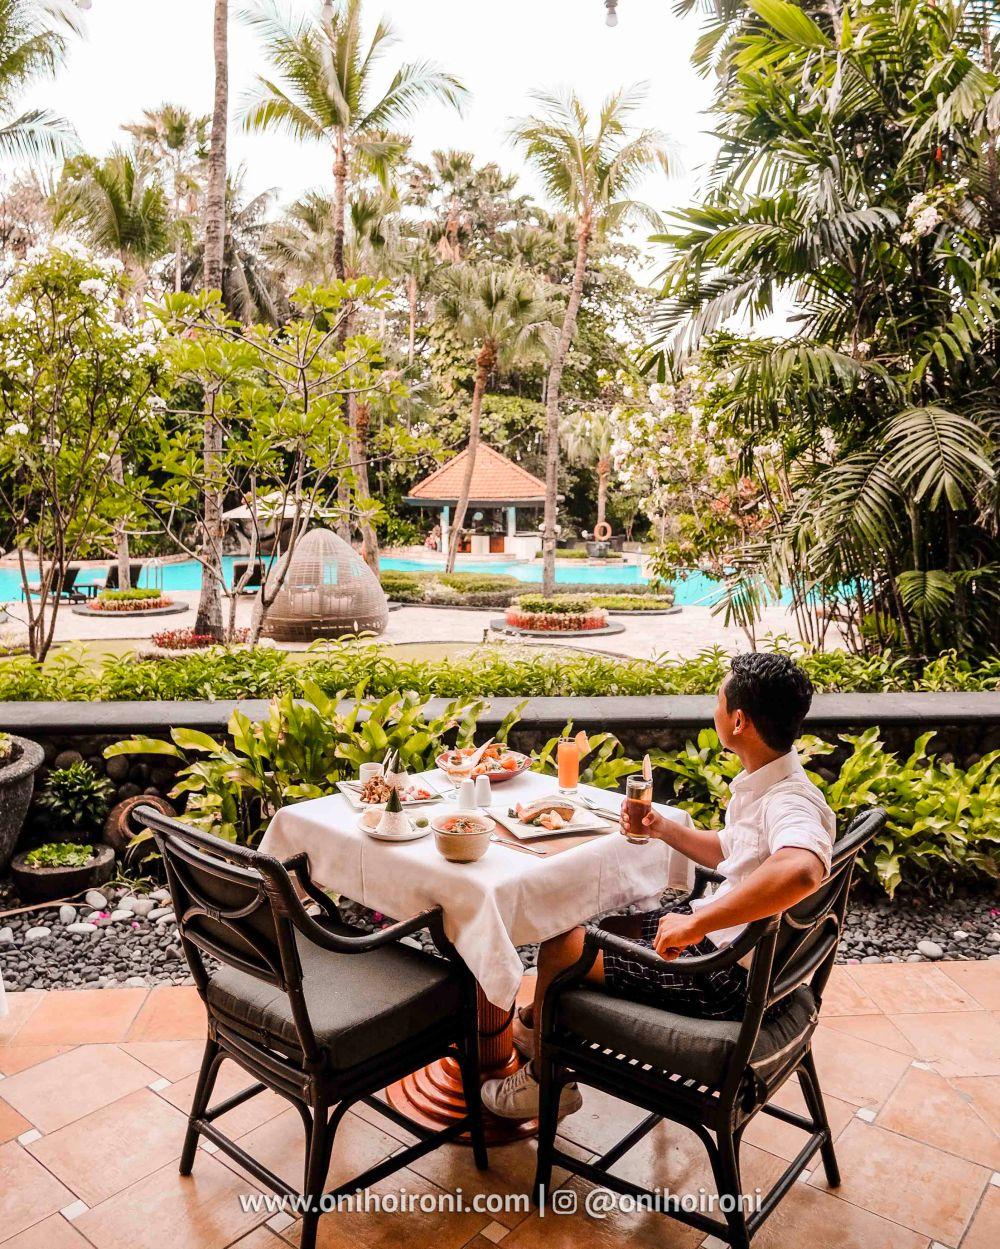 2 Review food makanan Jamoo Resto Shangrila Surabaya Hotel Oni hoironi.jpg